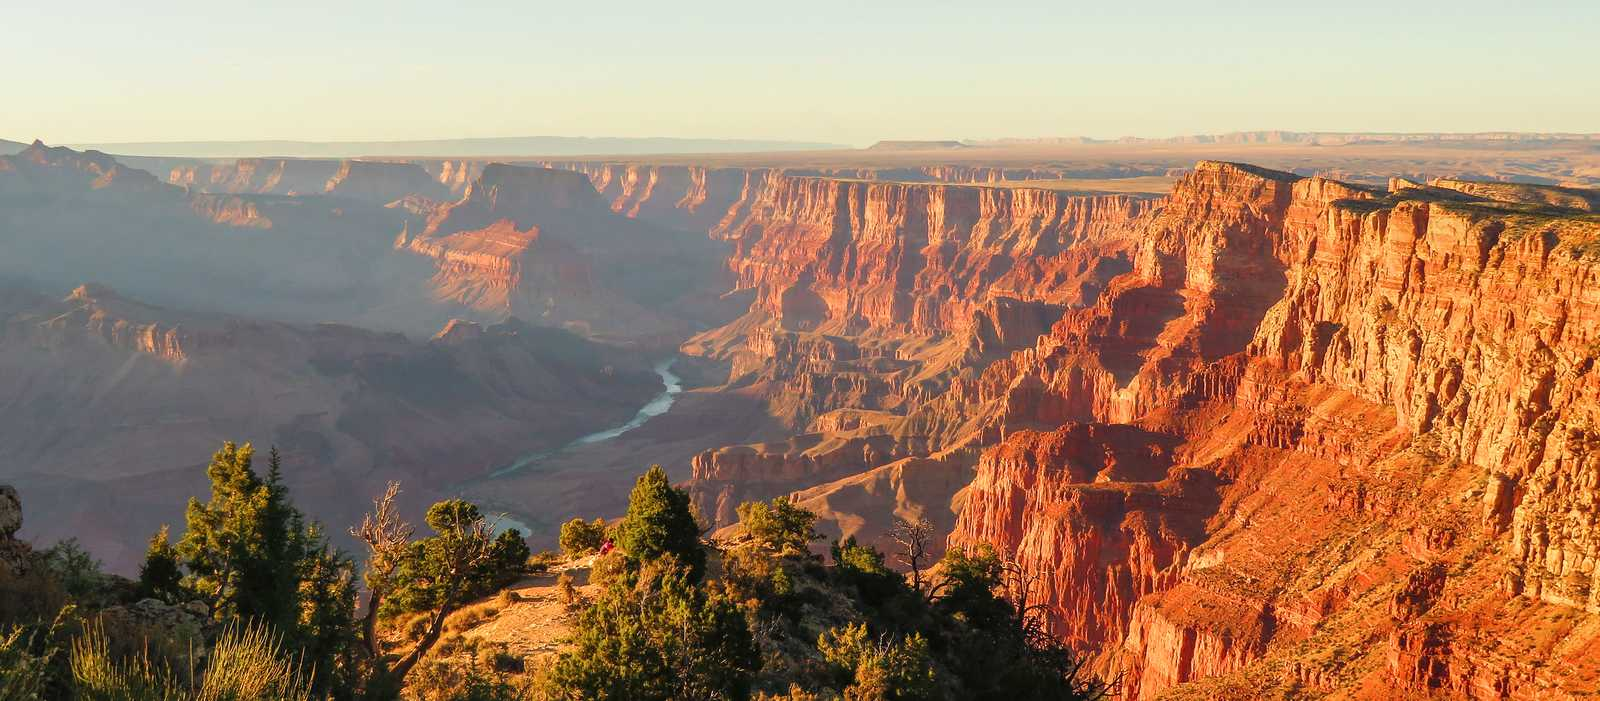 Eindrücke des Grand-Canyon-Nationalpark im US-Bundesstaat Arizona